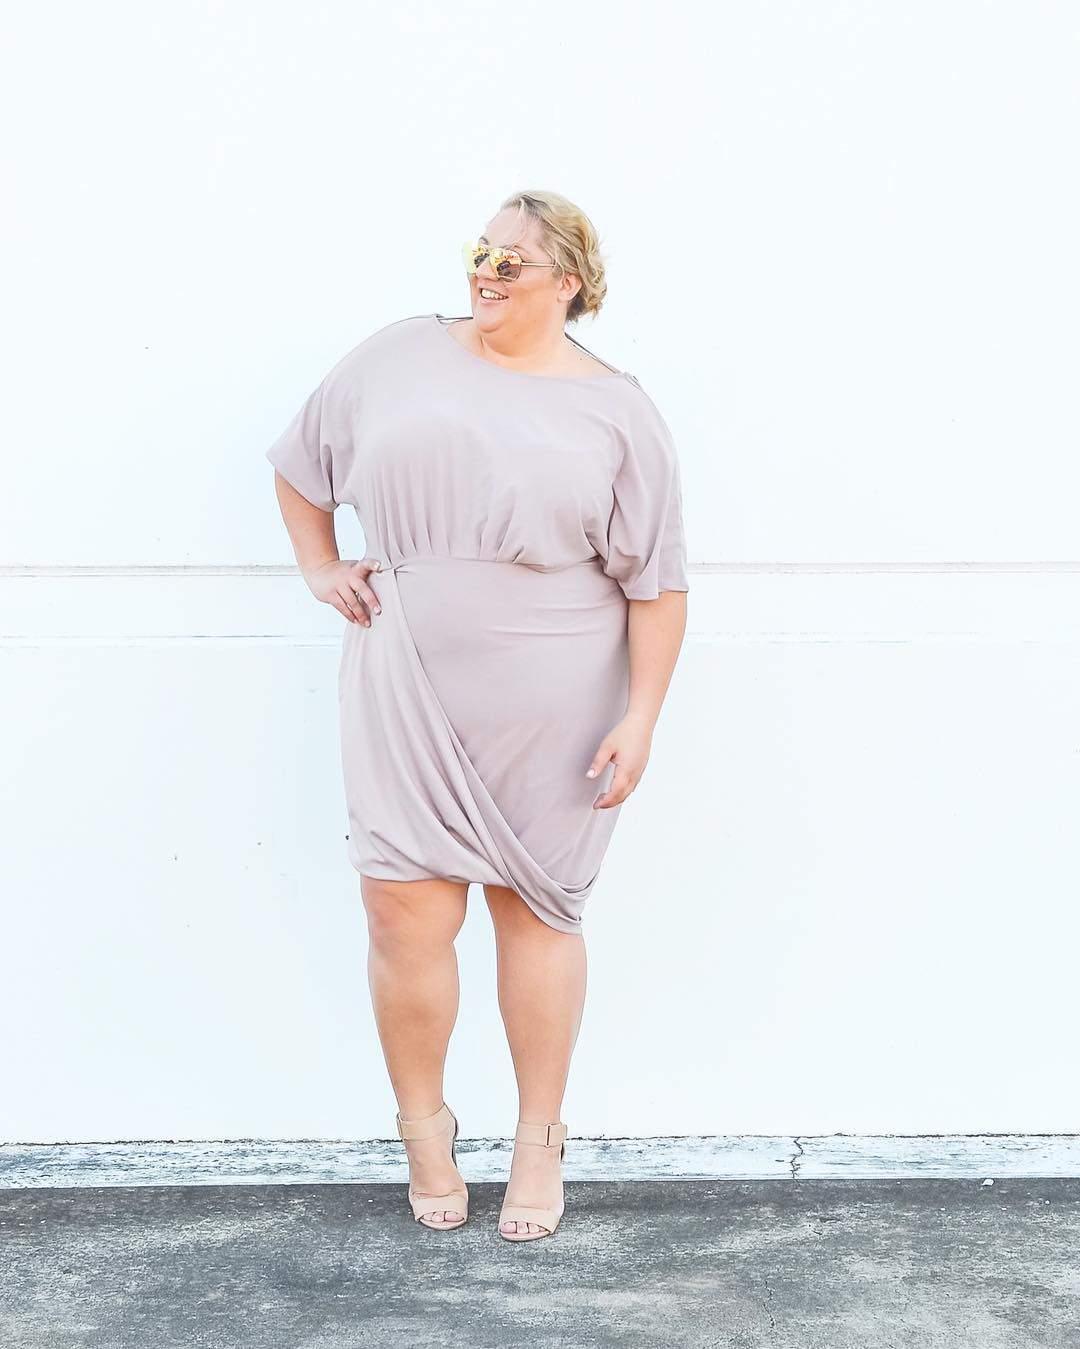 Plus size blogger spotlight- Suger Coat It